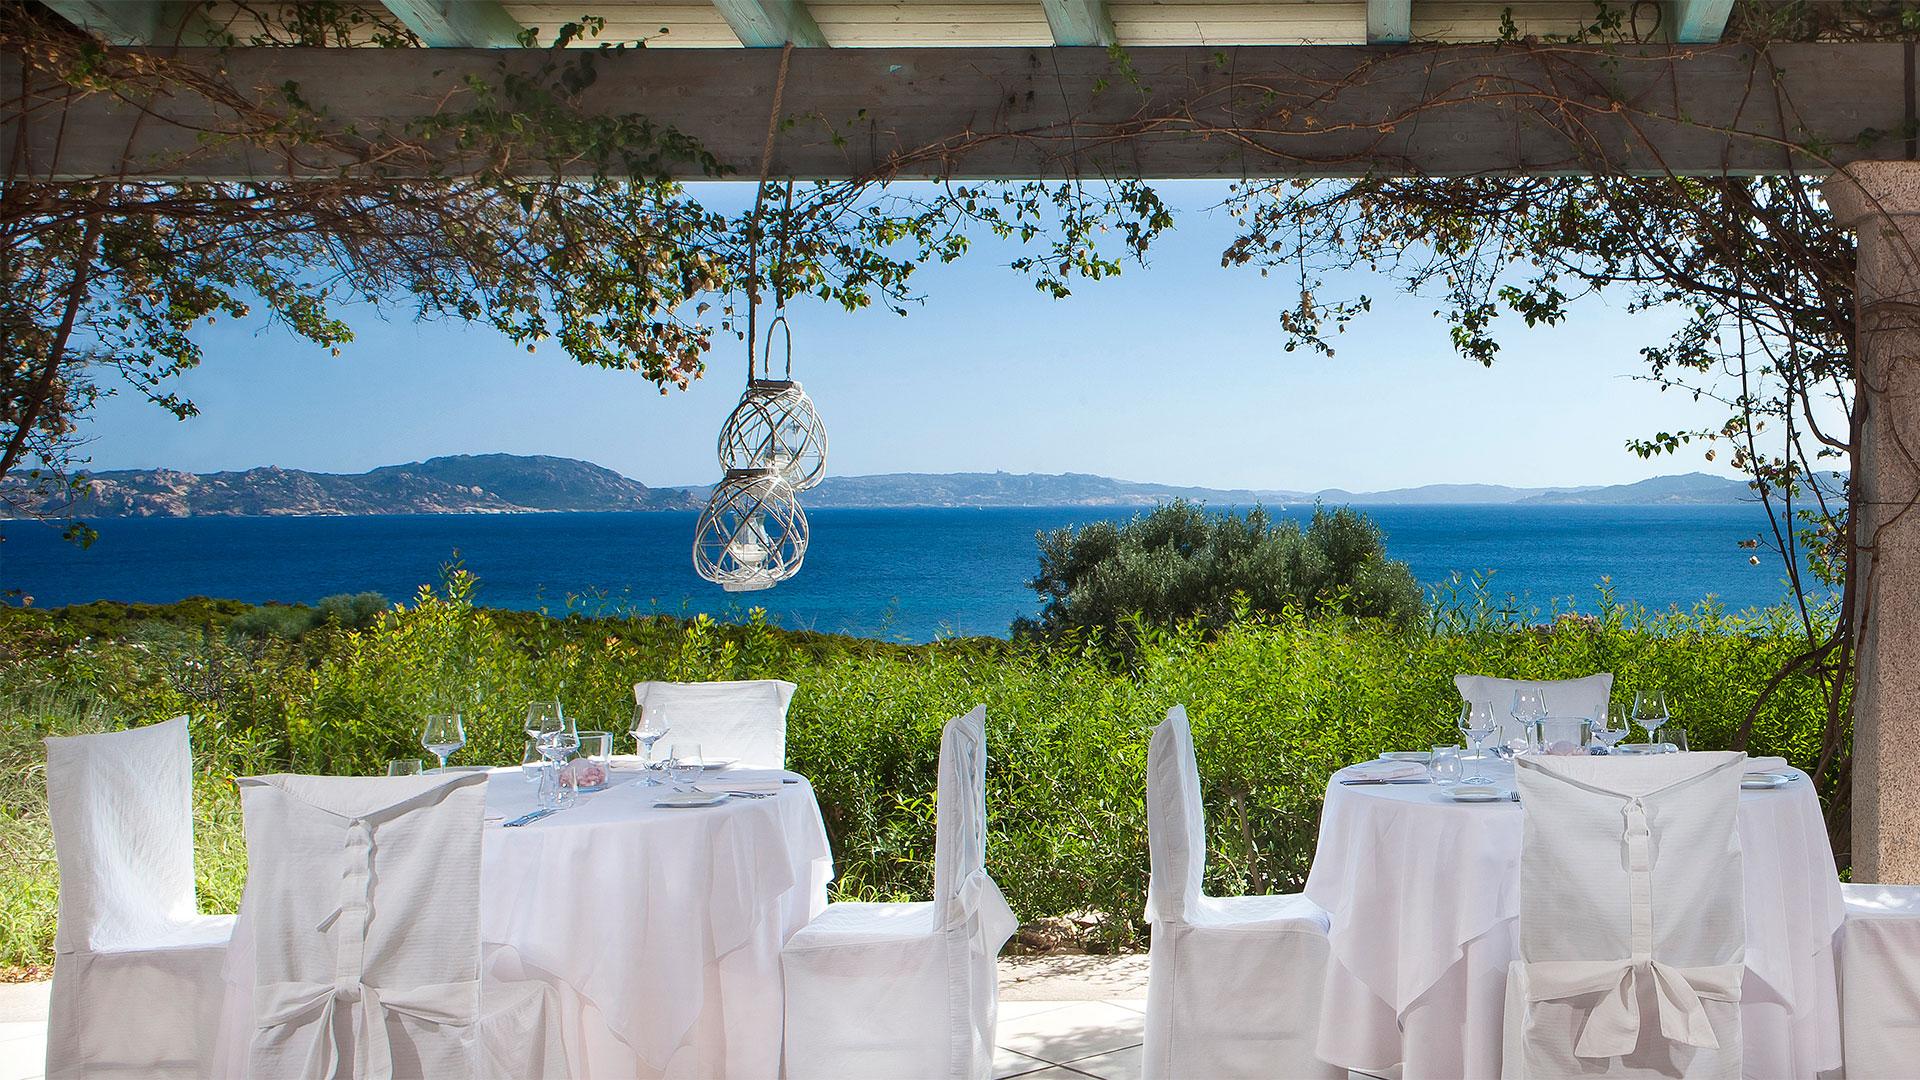 resort-valle-erica-slider-ristoranti-grecale-sardegna-2